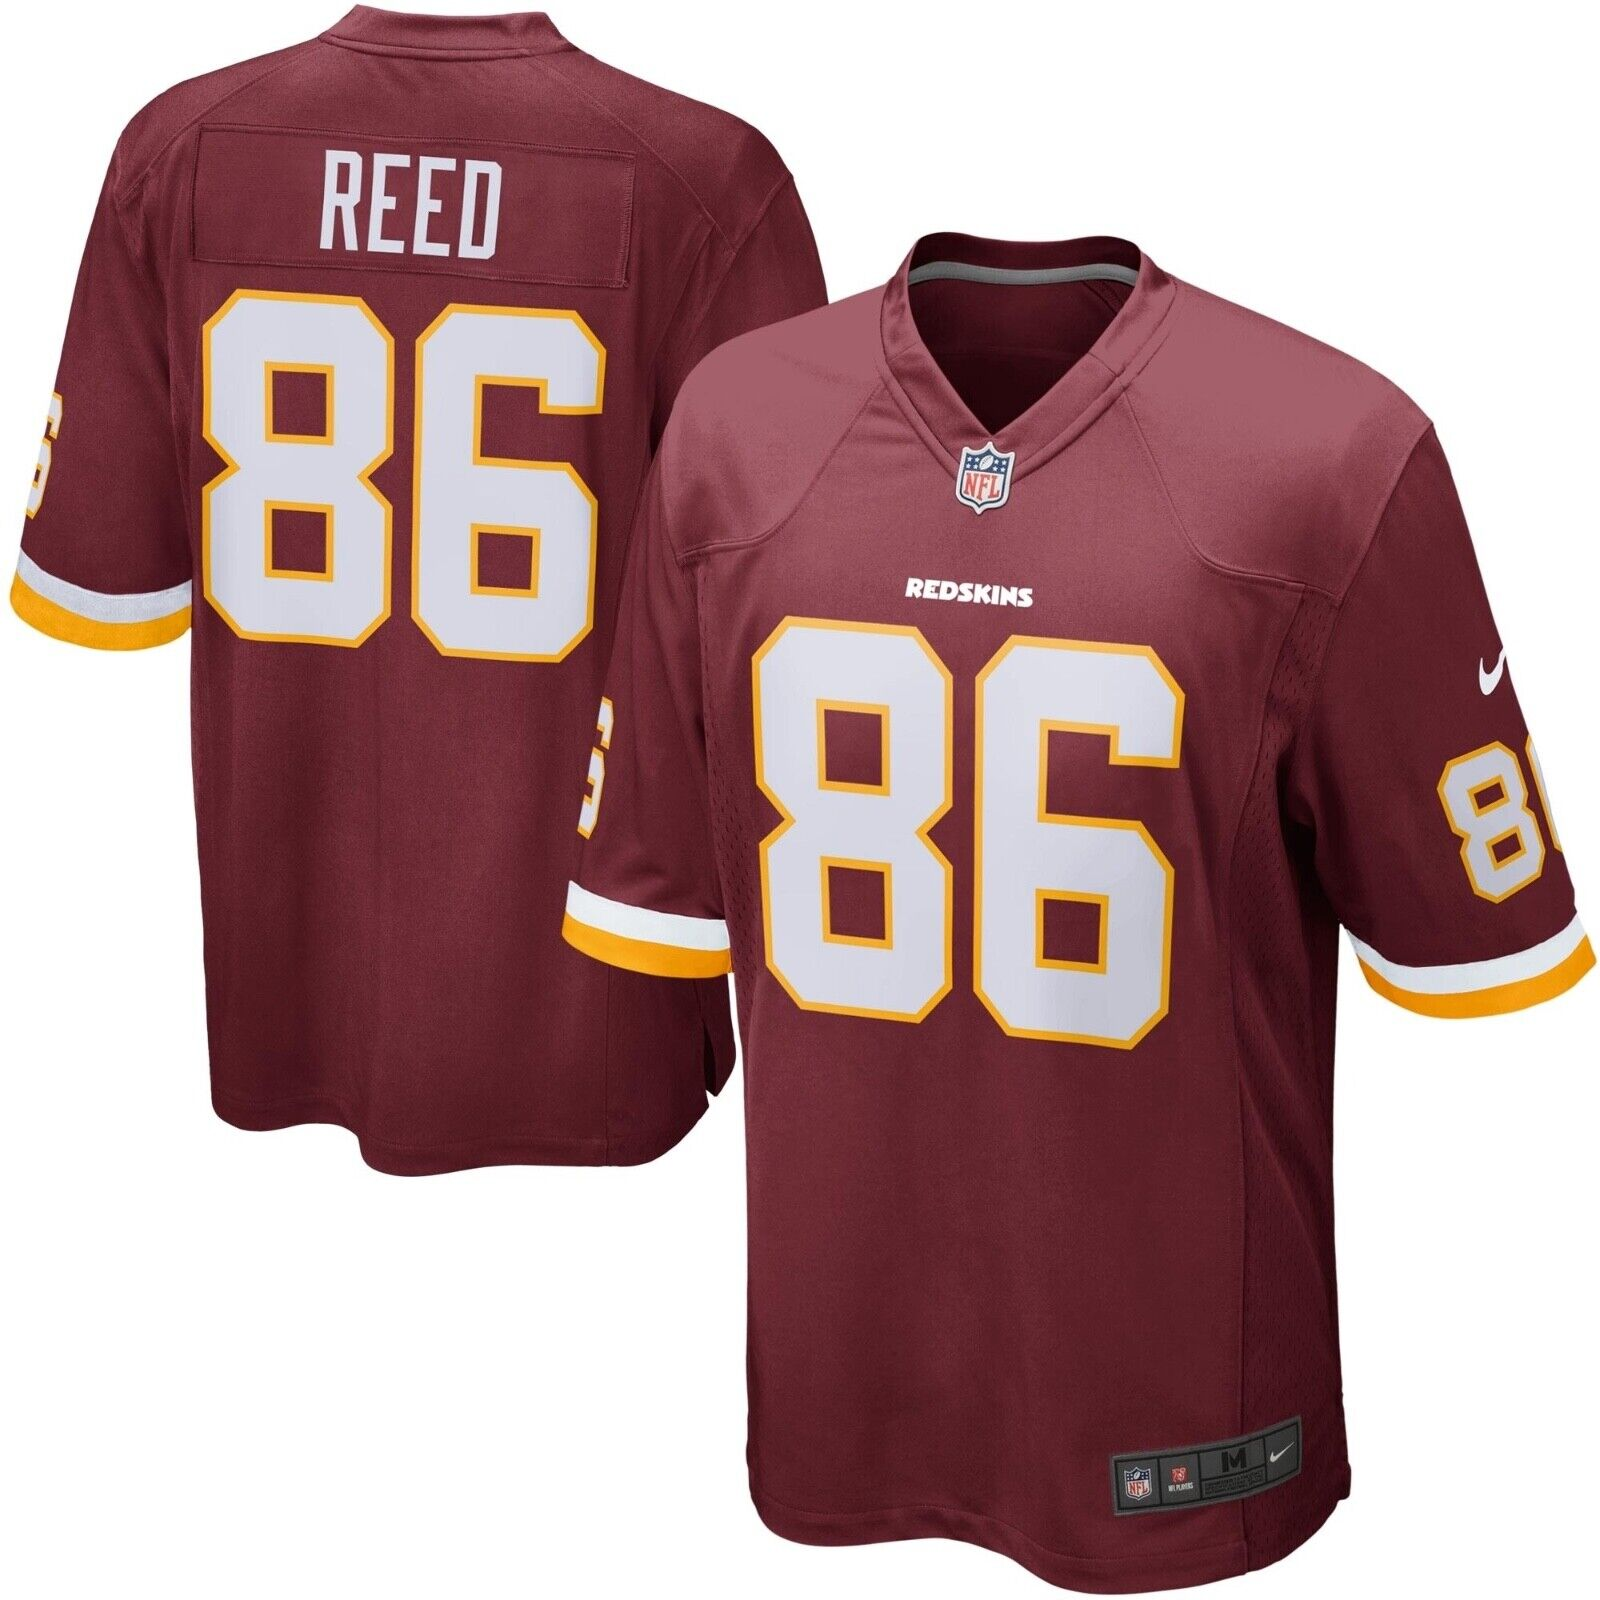 Jordan Reed Washington Redskins Nike on Field Men's XL Jersey NFL